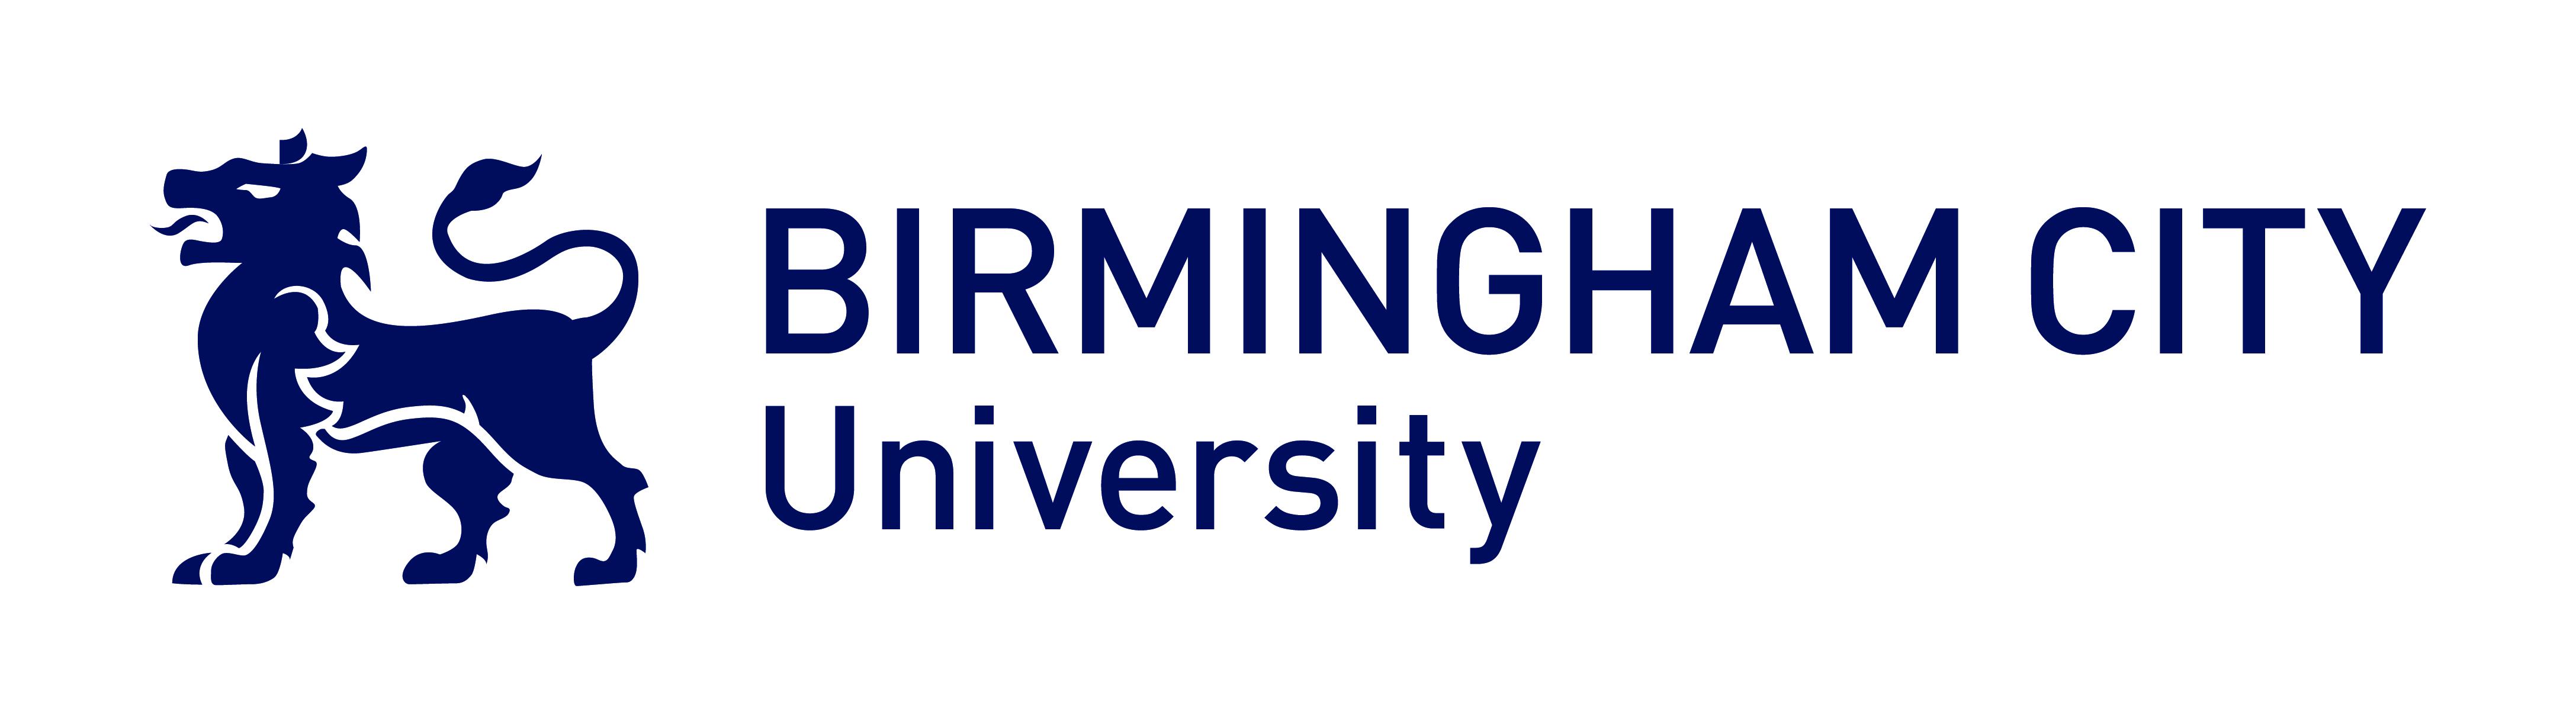 Birmingham City Univeristy